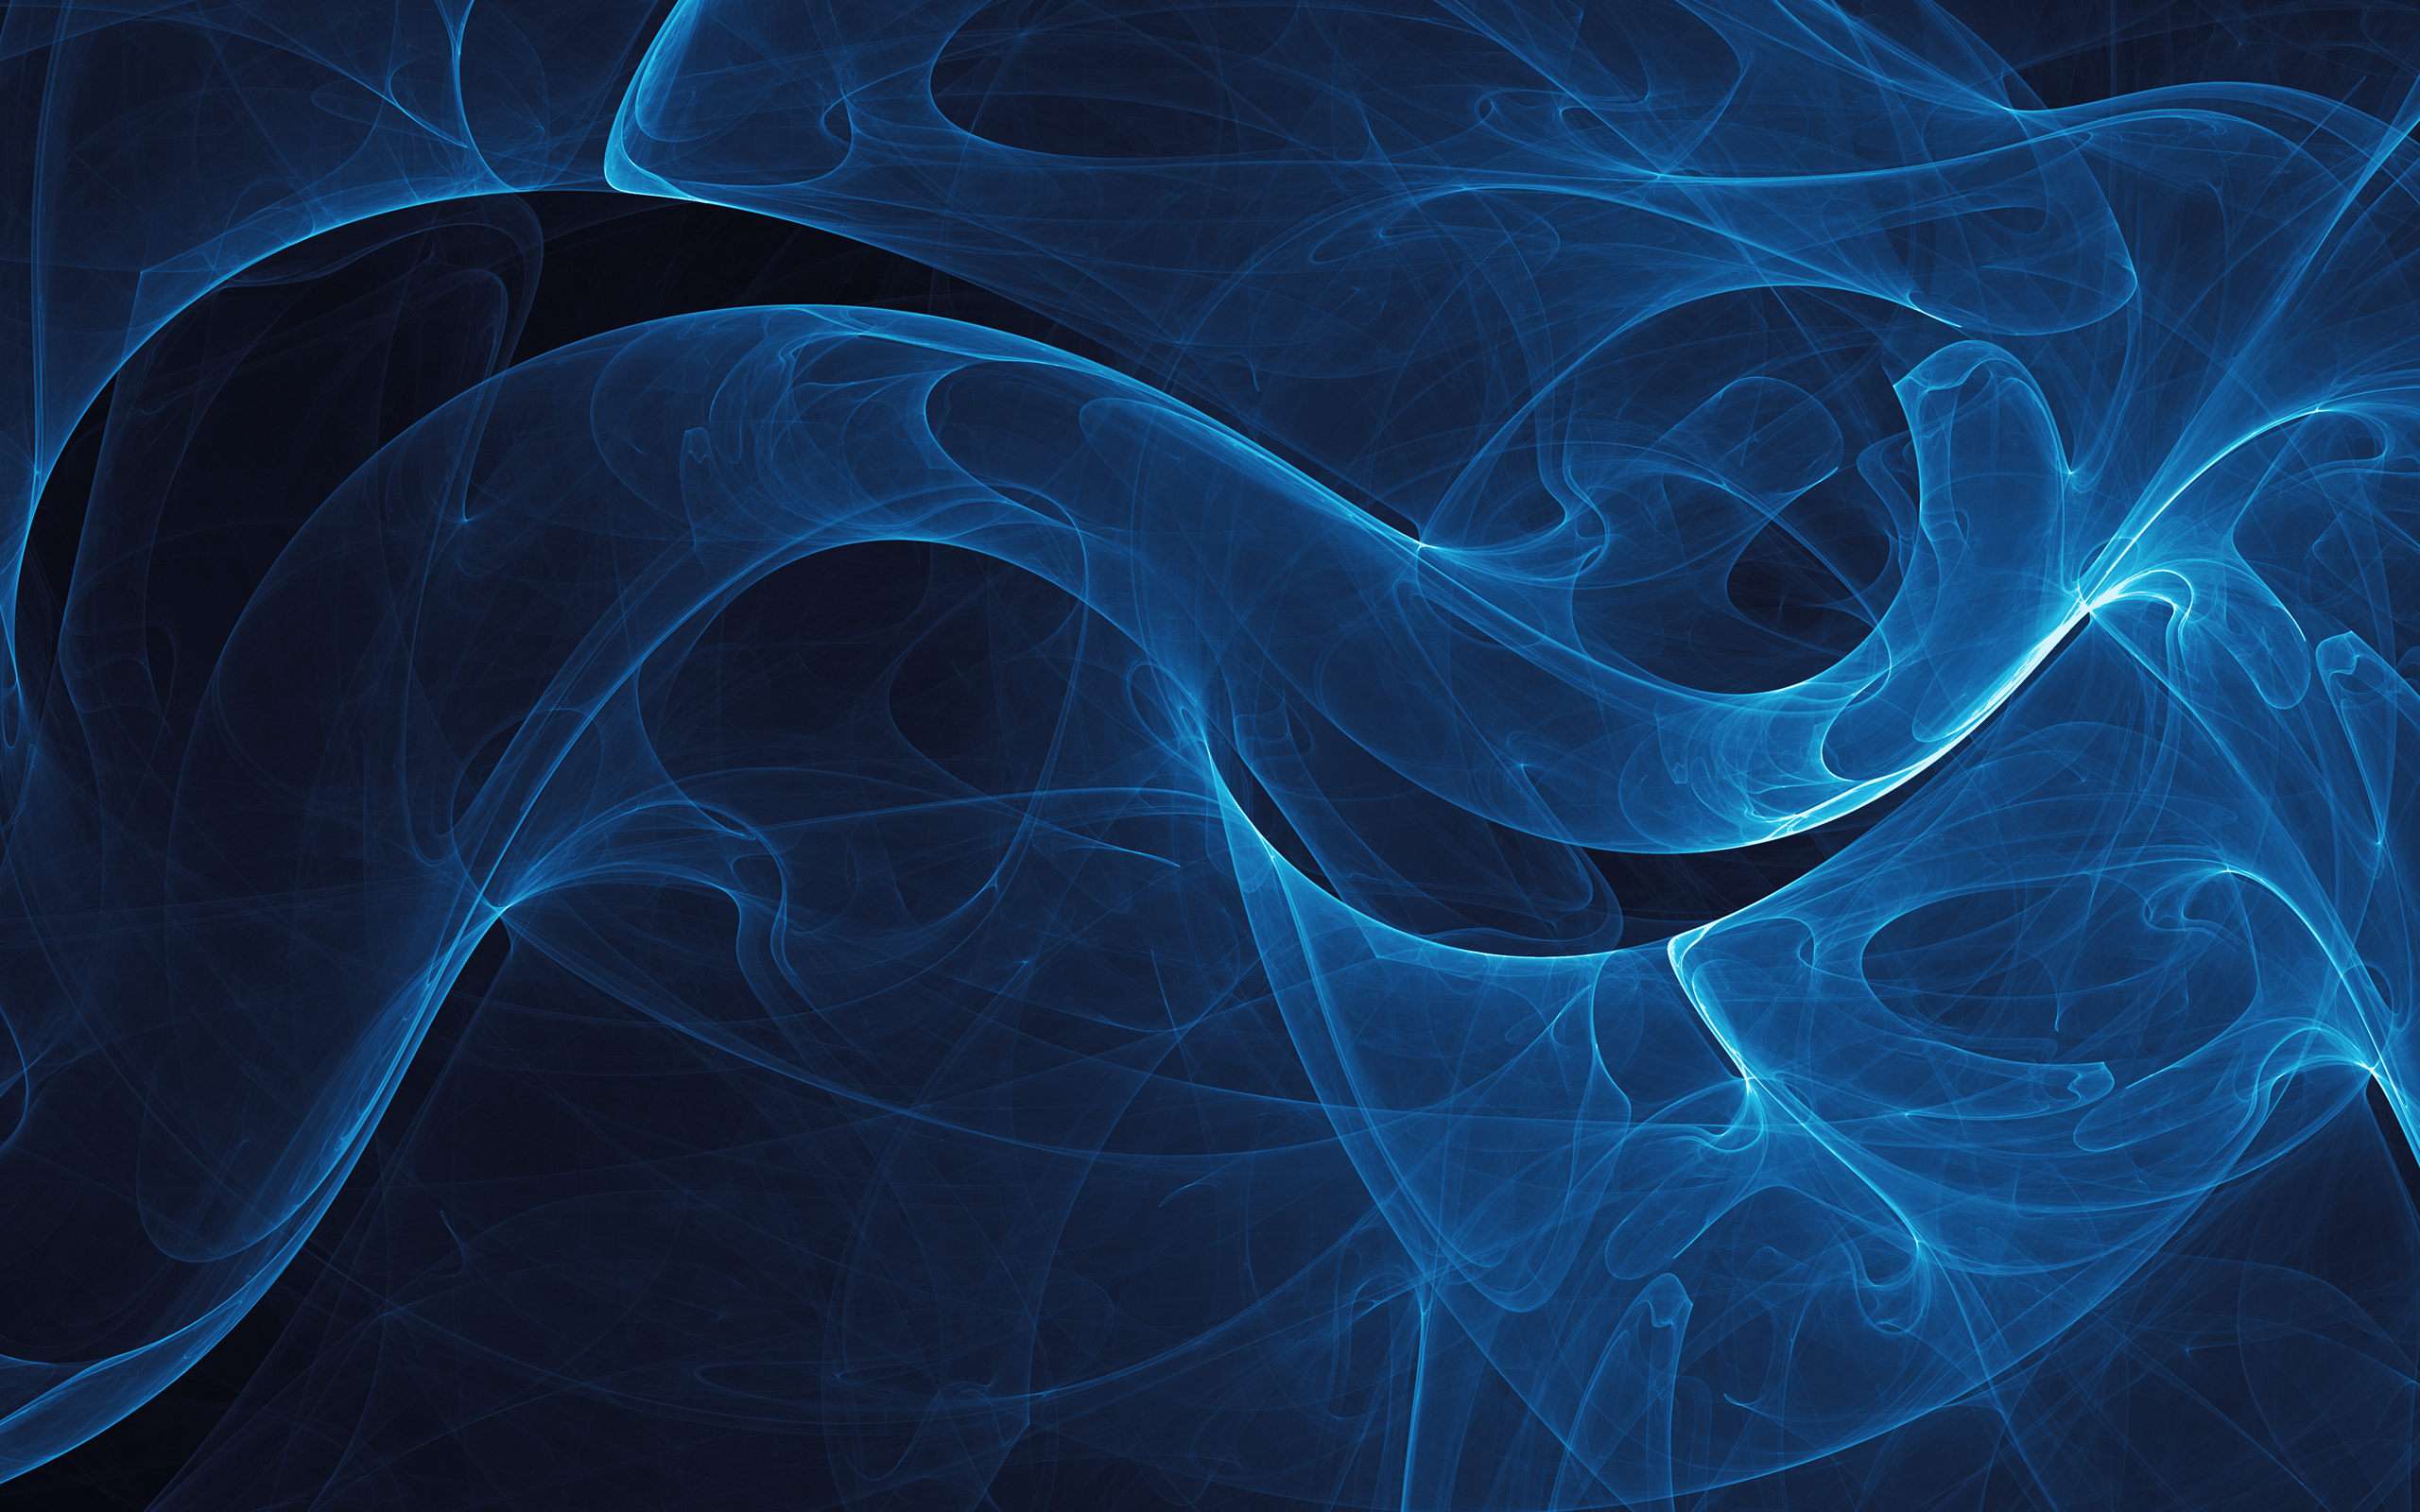 Cute Infinity Wallpaper: Infinity Wallpaper Backgrounds